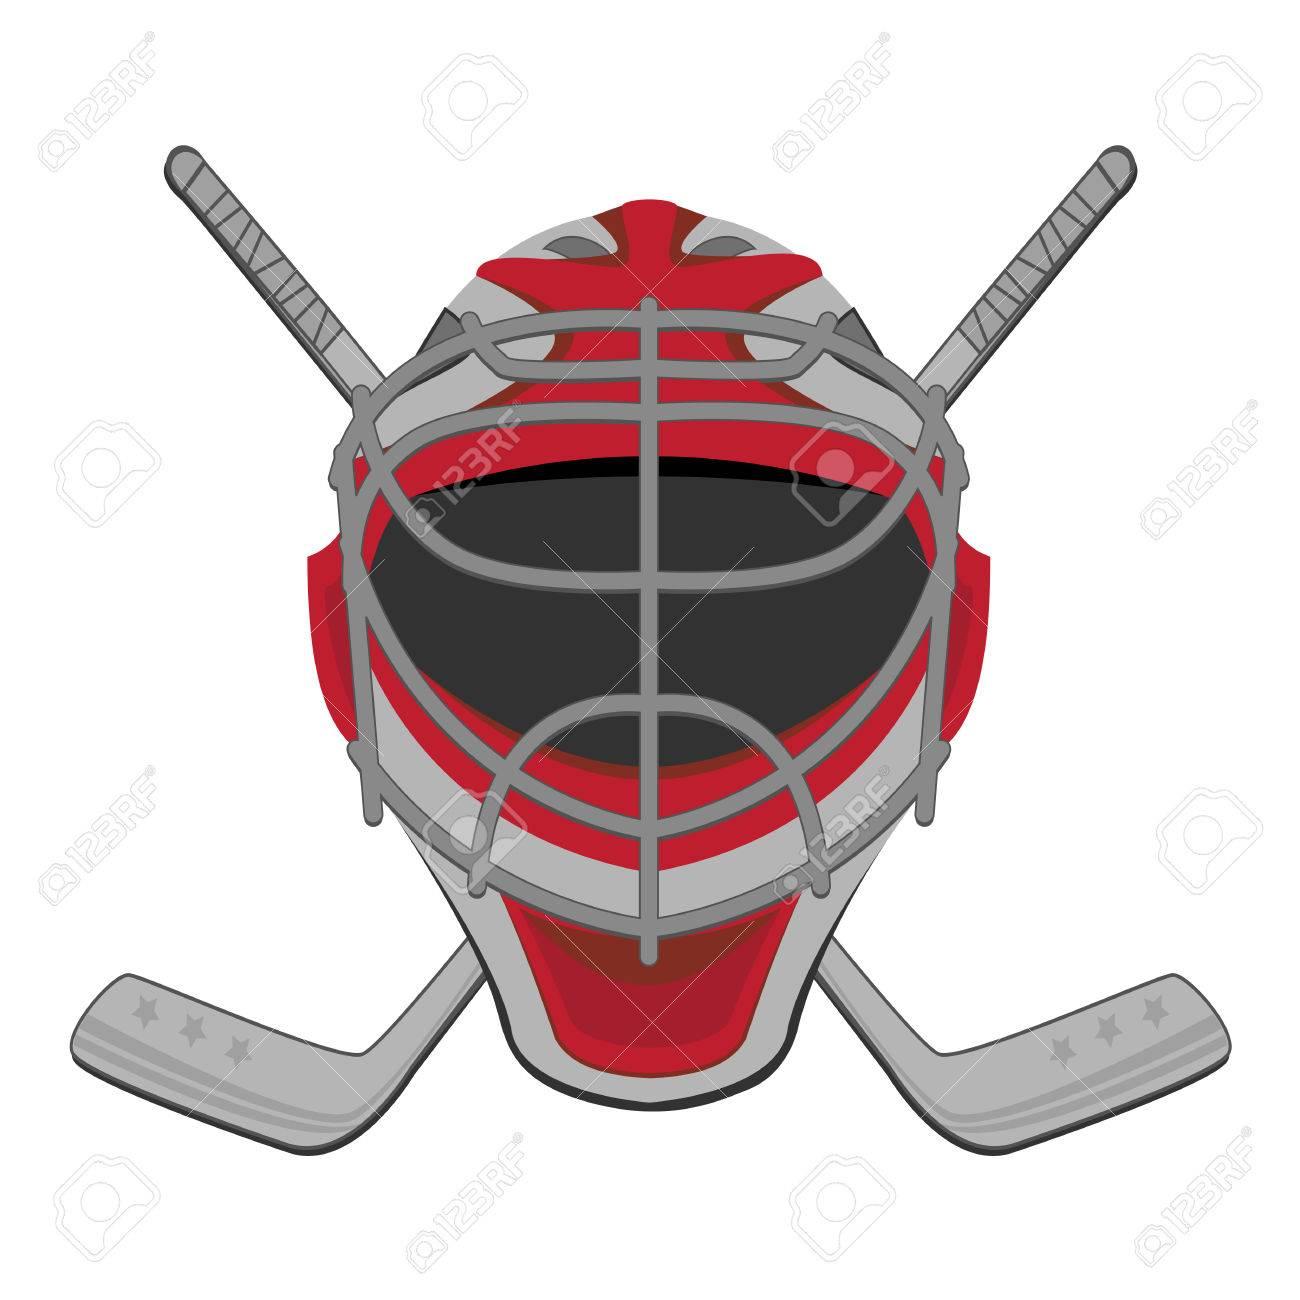 Hockey goalie ice hockey goalie mask sticks stock vector 25145732